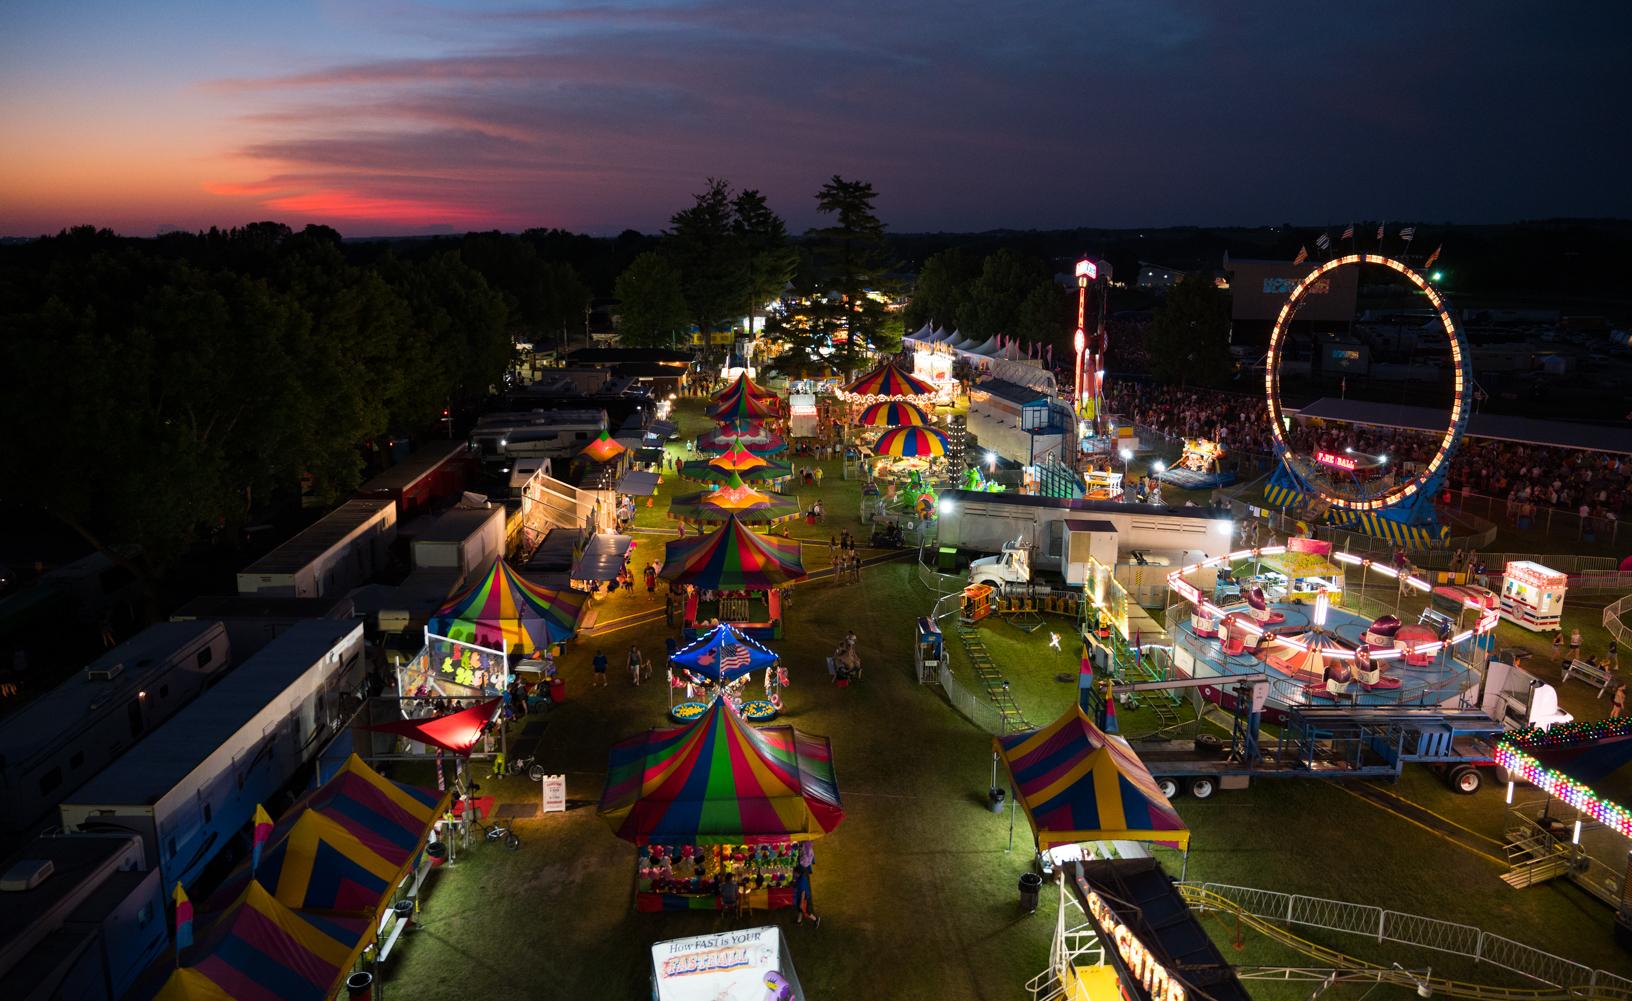 A Ferris wheel ride reveals the beauty of the Jones County Fair at dusk. Photo credit: Joseph L. Murphy/Iowa Soybean Association